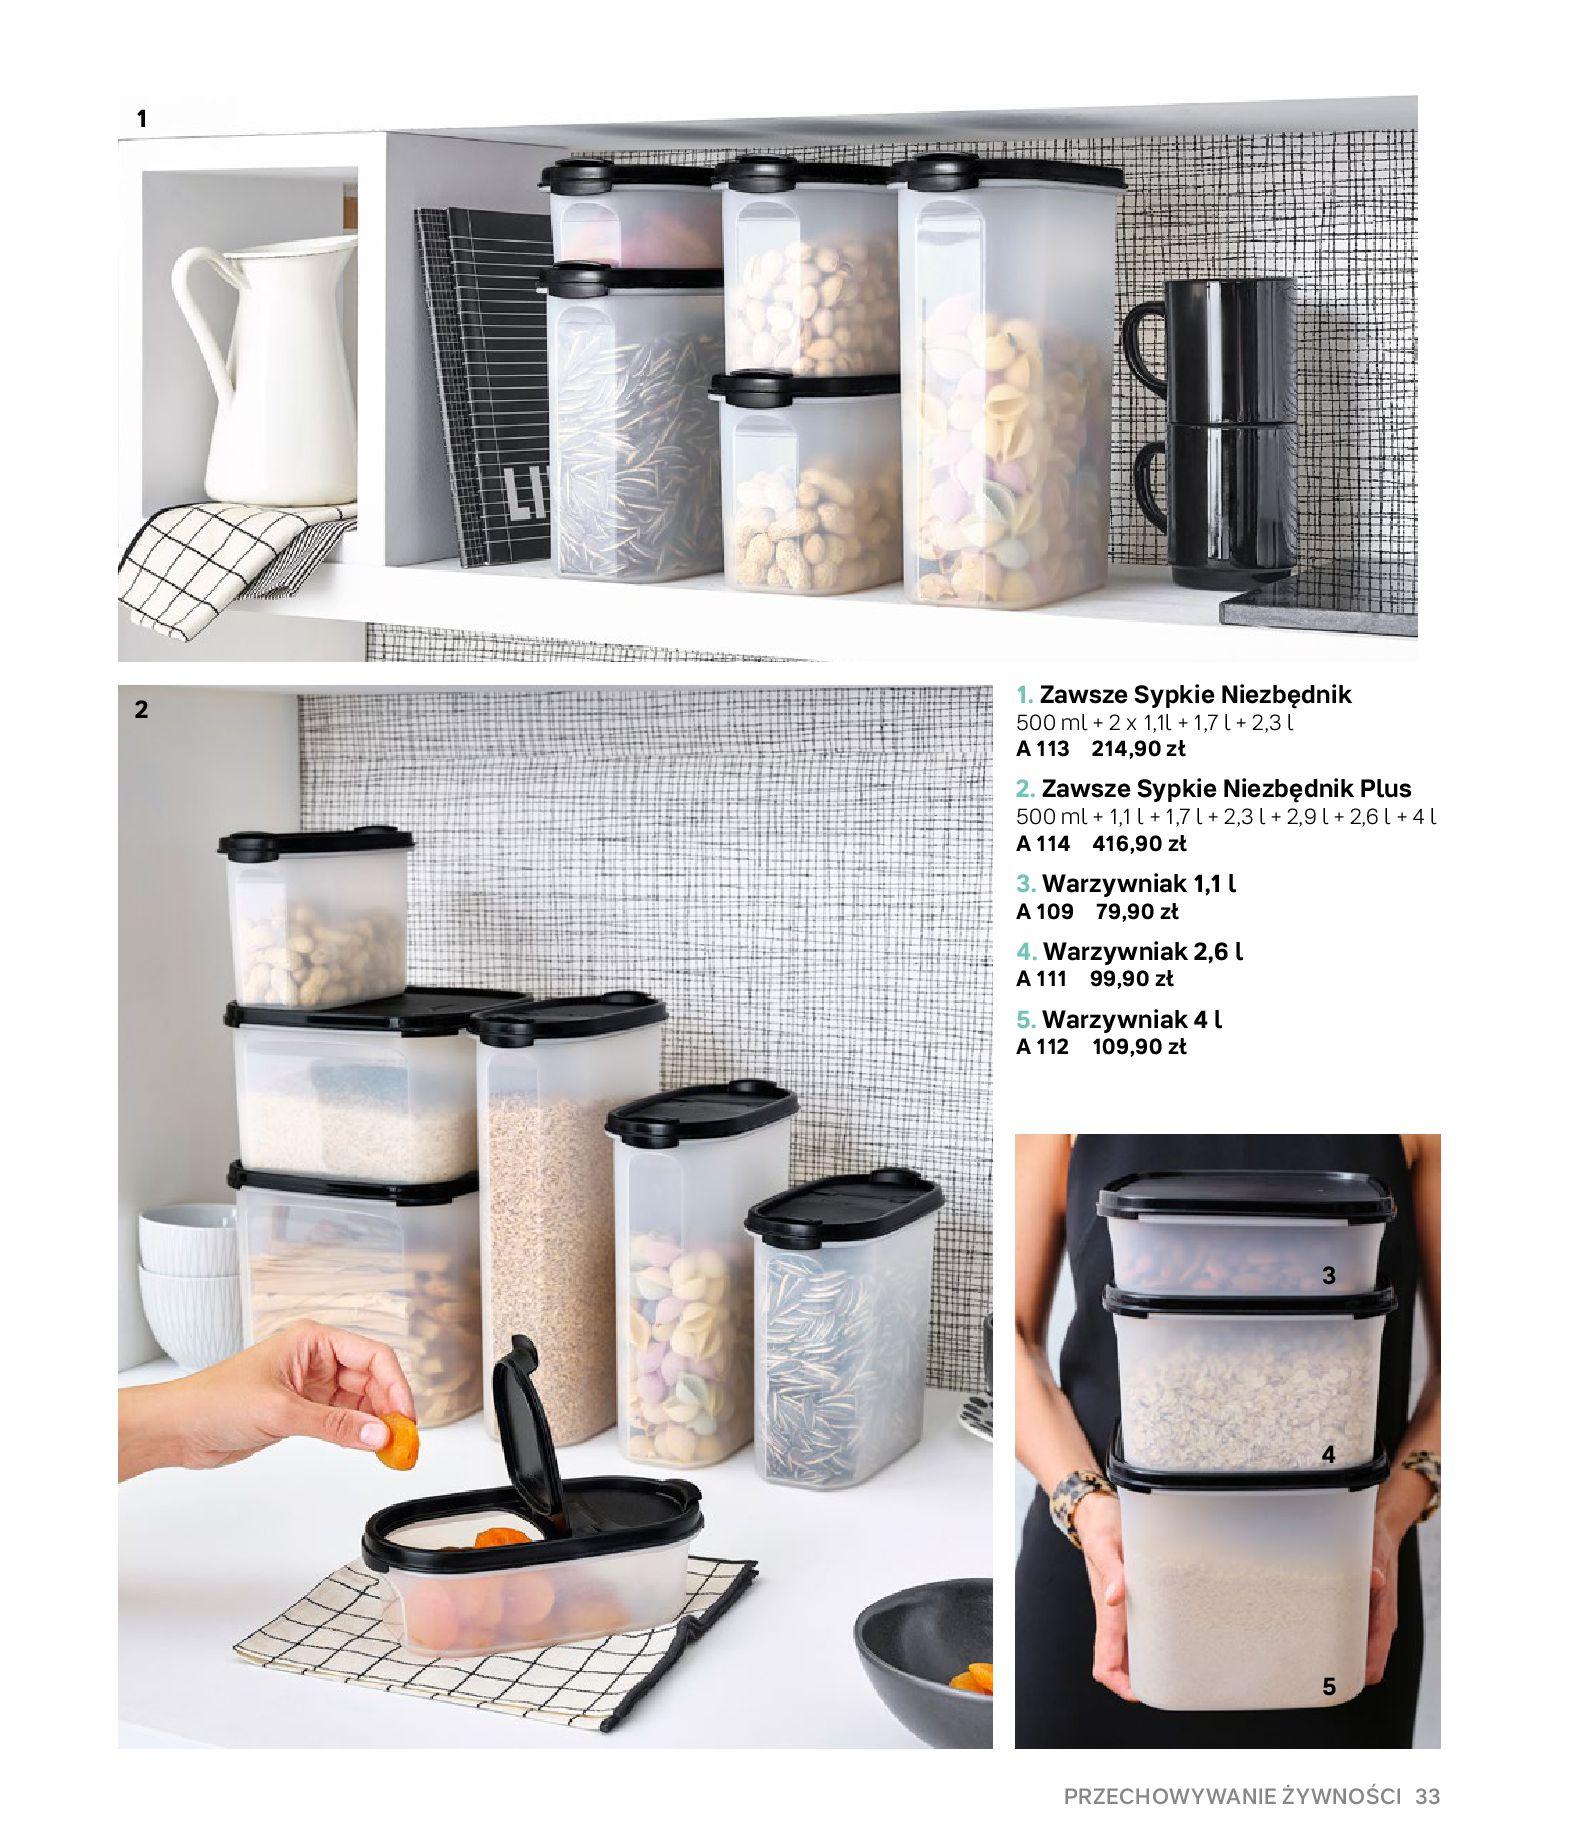 Gazetka Tupperware: Gazetka Tupperware - Katalog wiosna/ lato 2021-05-10 page-33